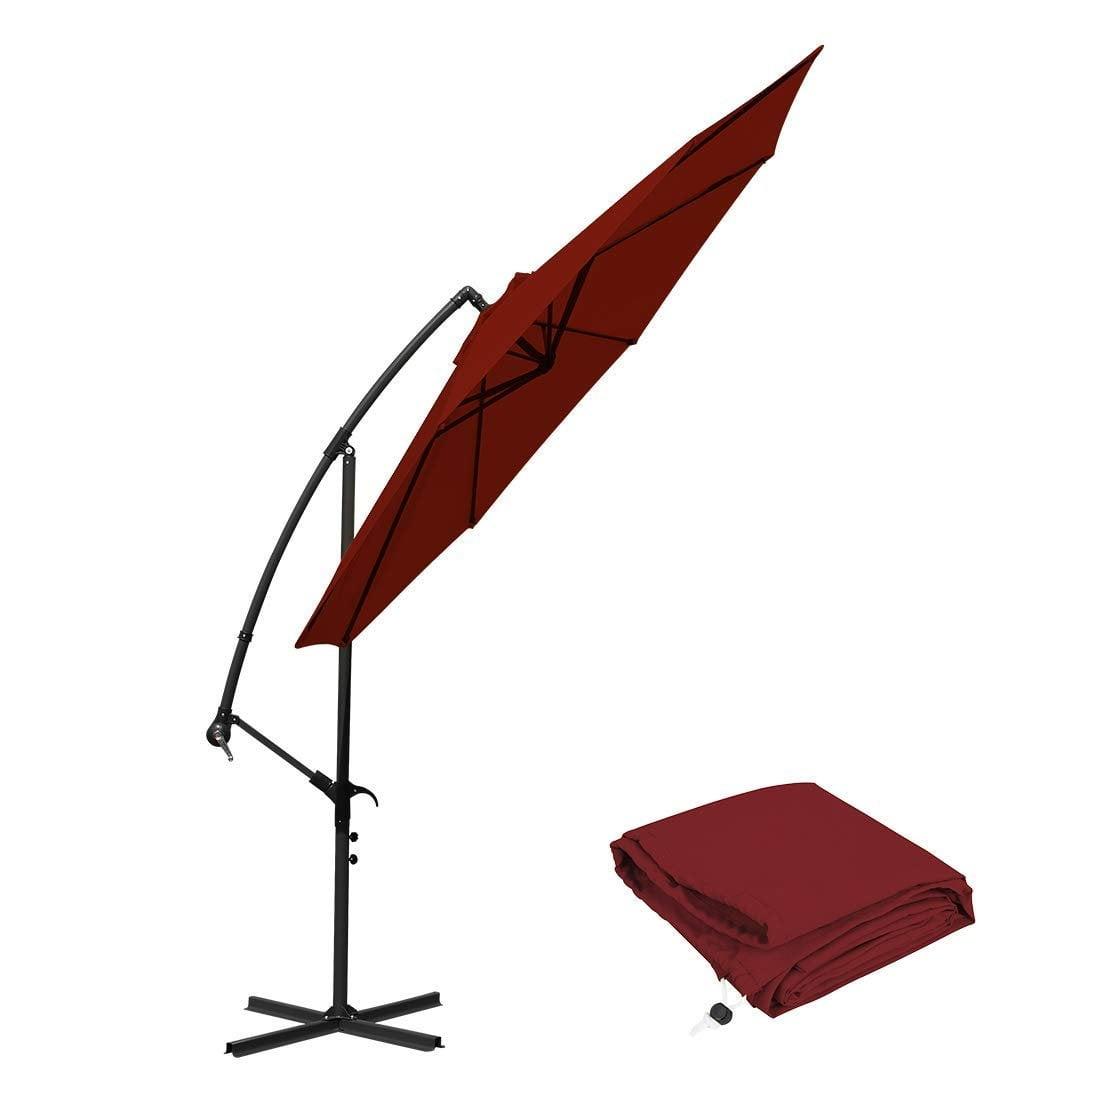 10 Ft Cantilever Patio Umbrellas, Red Outdoor Water Resistant Offset  Umbrella   Walmart.com